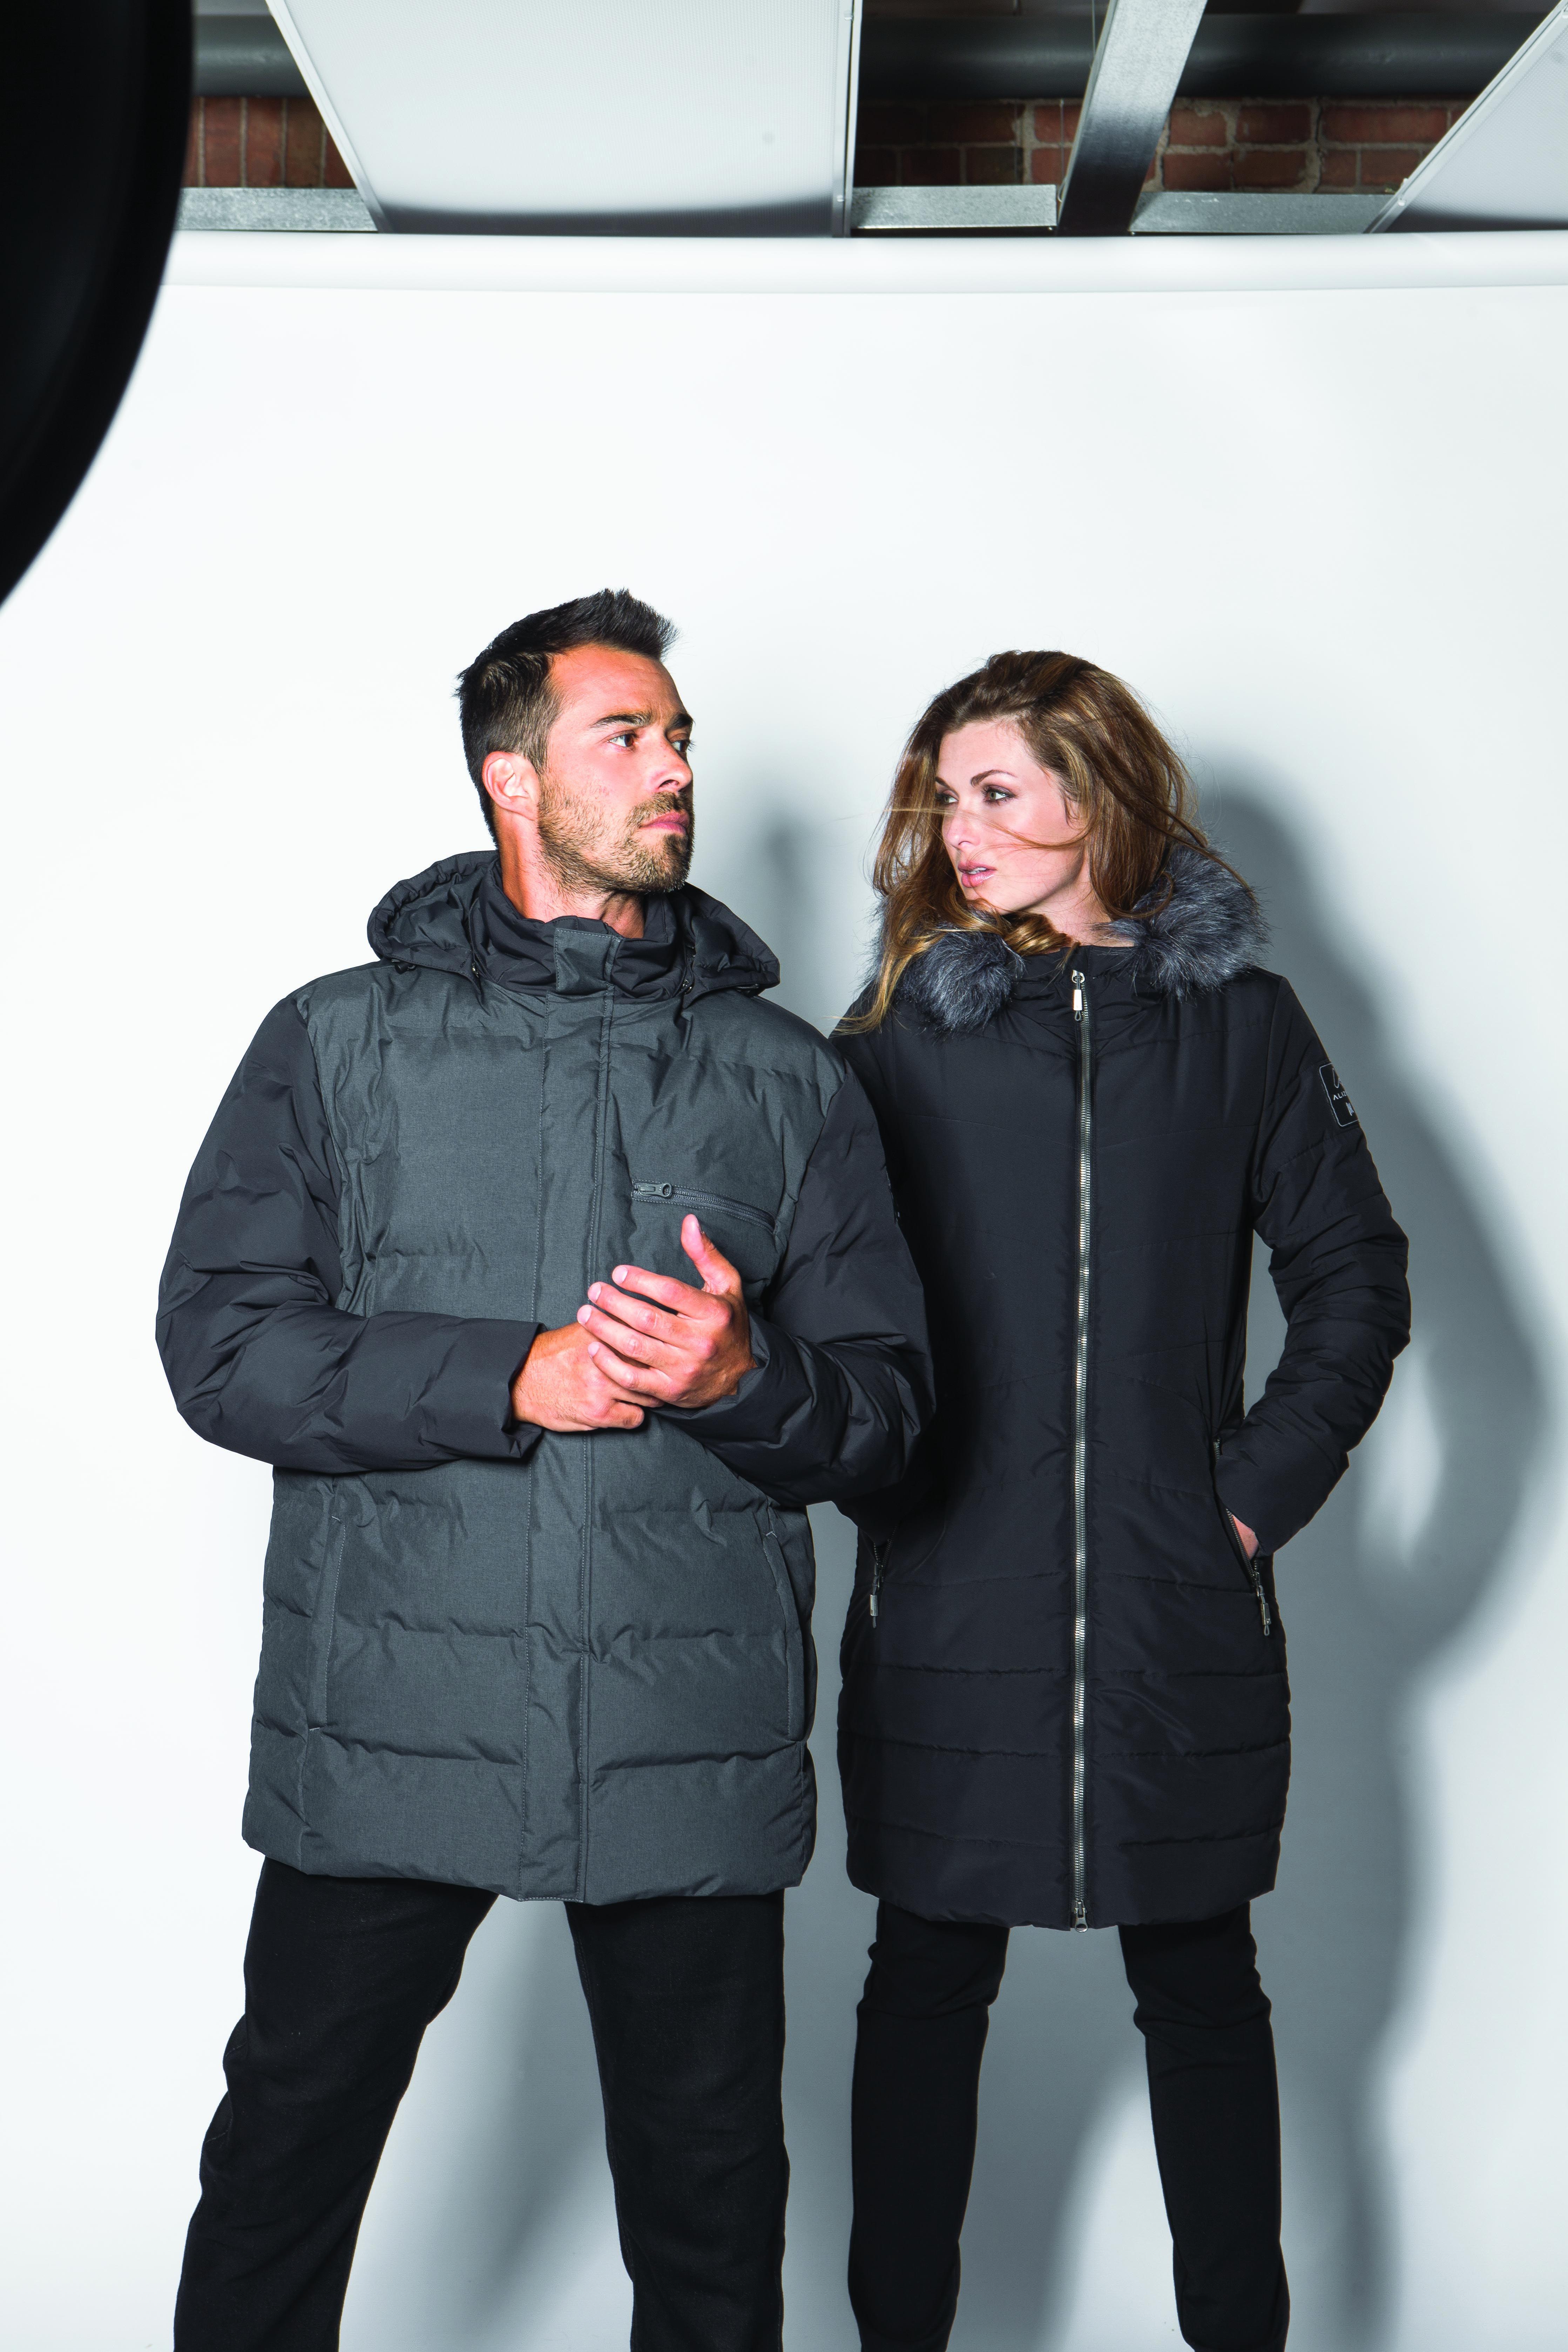 quebec mode femme homme men mensfashion automne hiver fashion  style fall winter womensfashion women coat jacket manteau  photoshoot